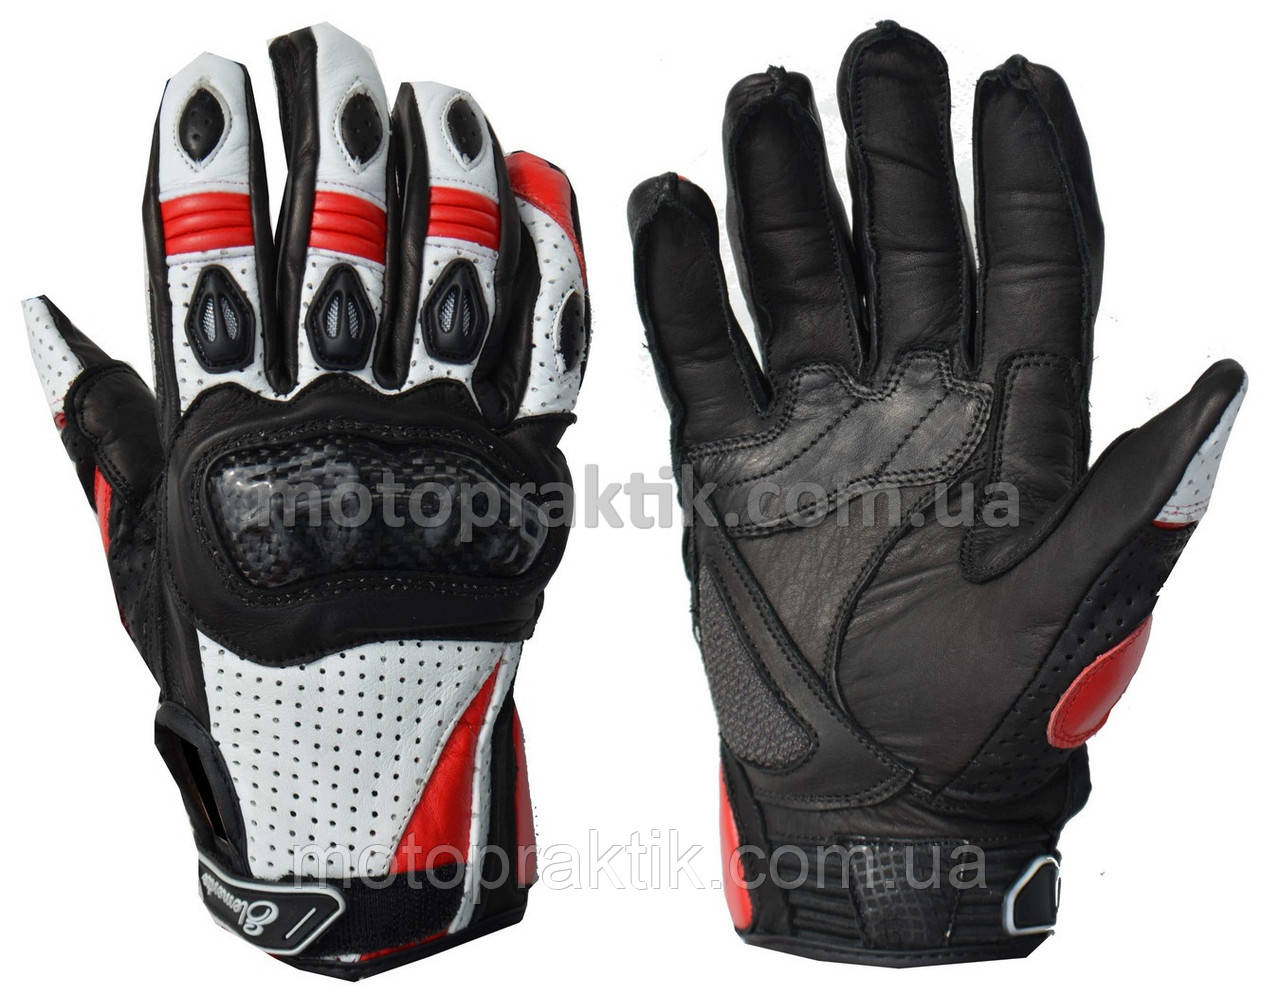 Elemento 188 Free Ride Gloves Blk/Wht/Red, L Мотоперчатки дорожные